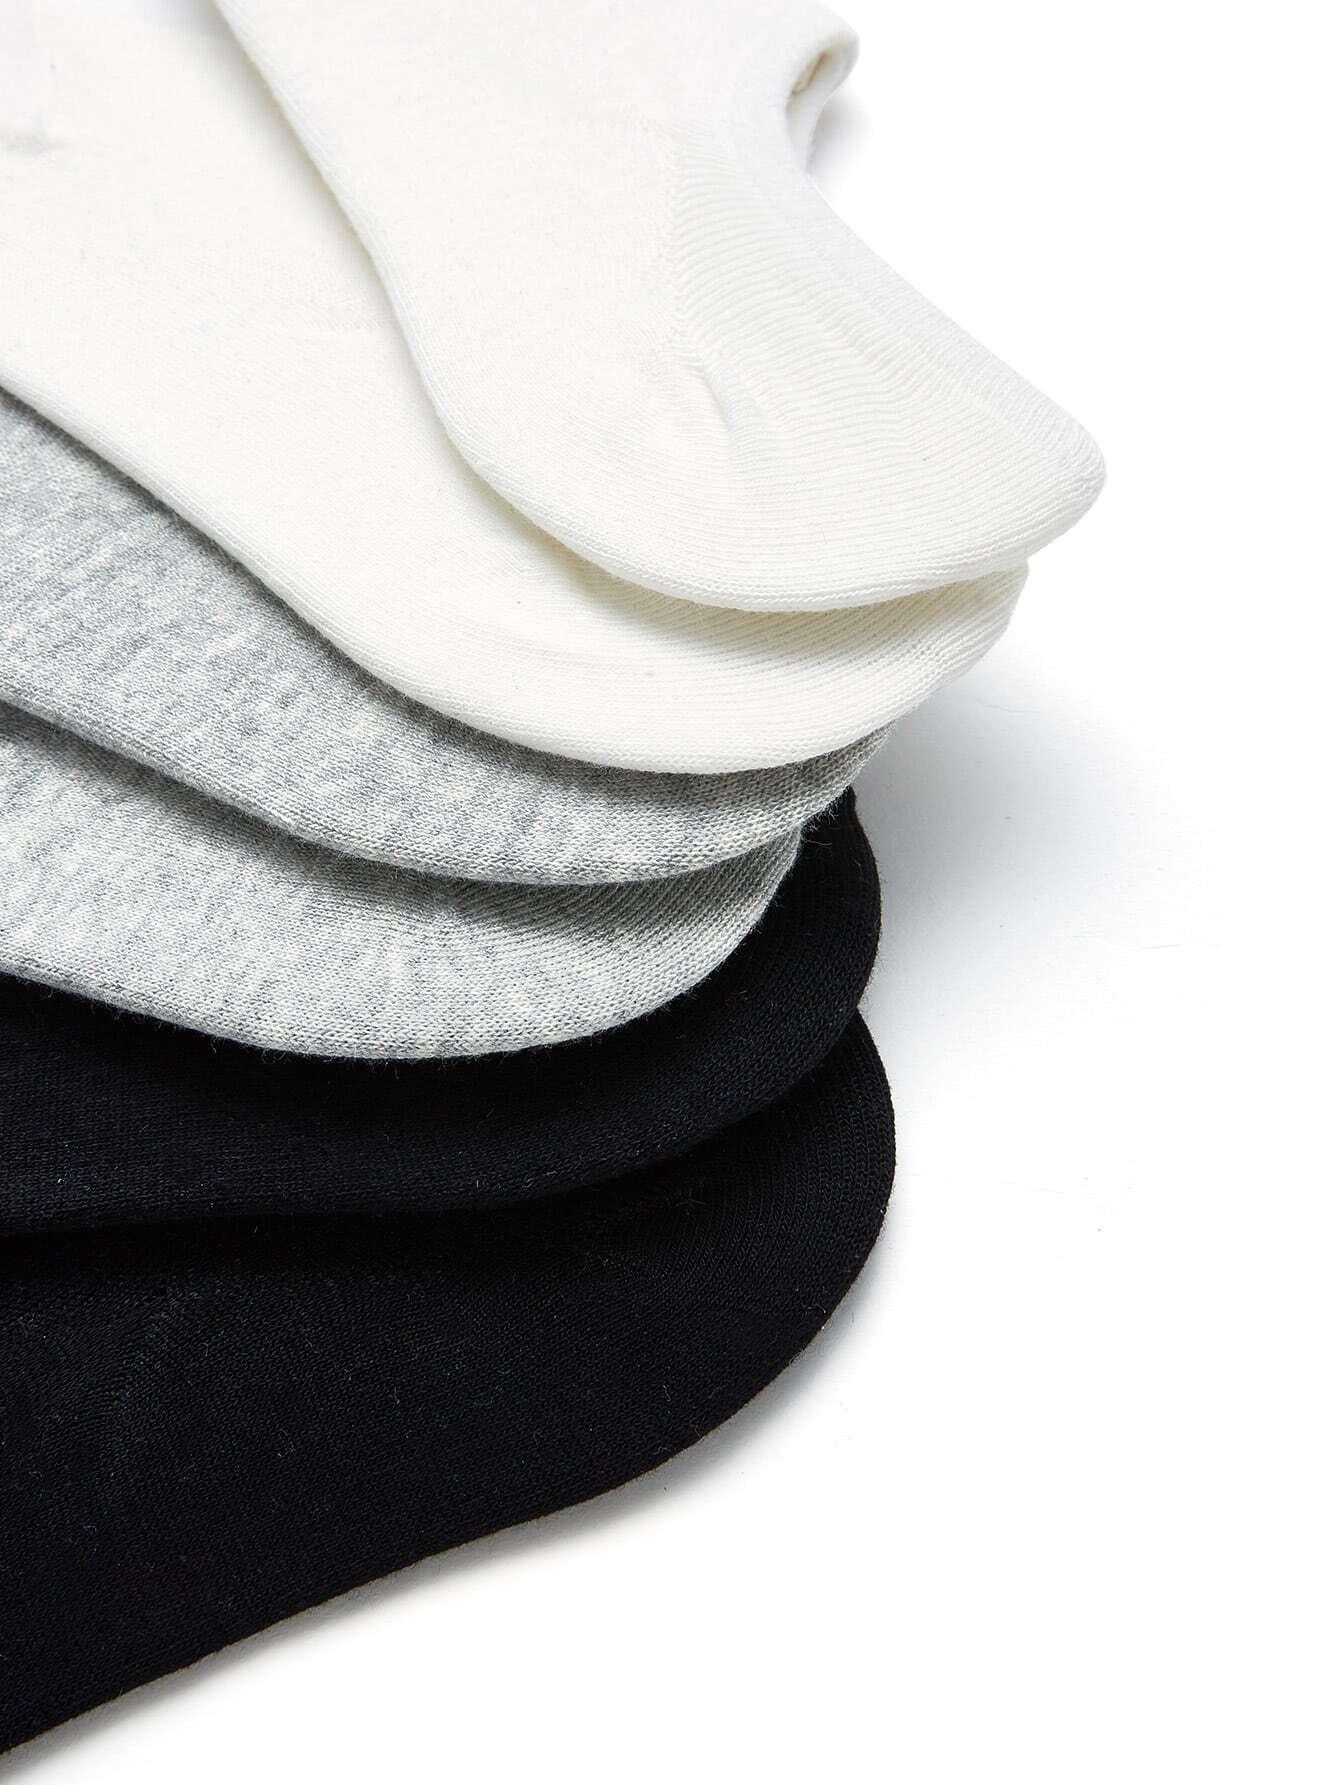 Plain Invisible Socks 6pairs